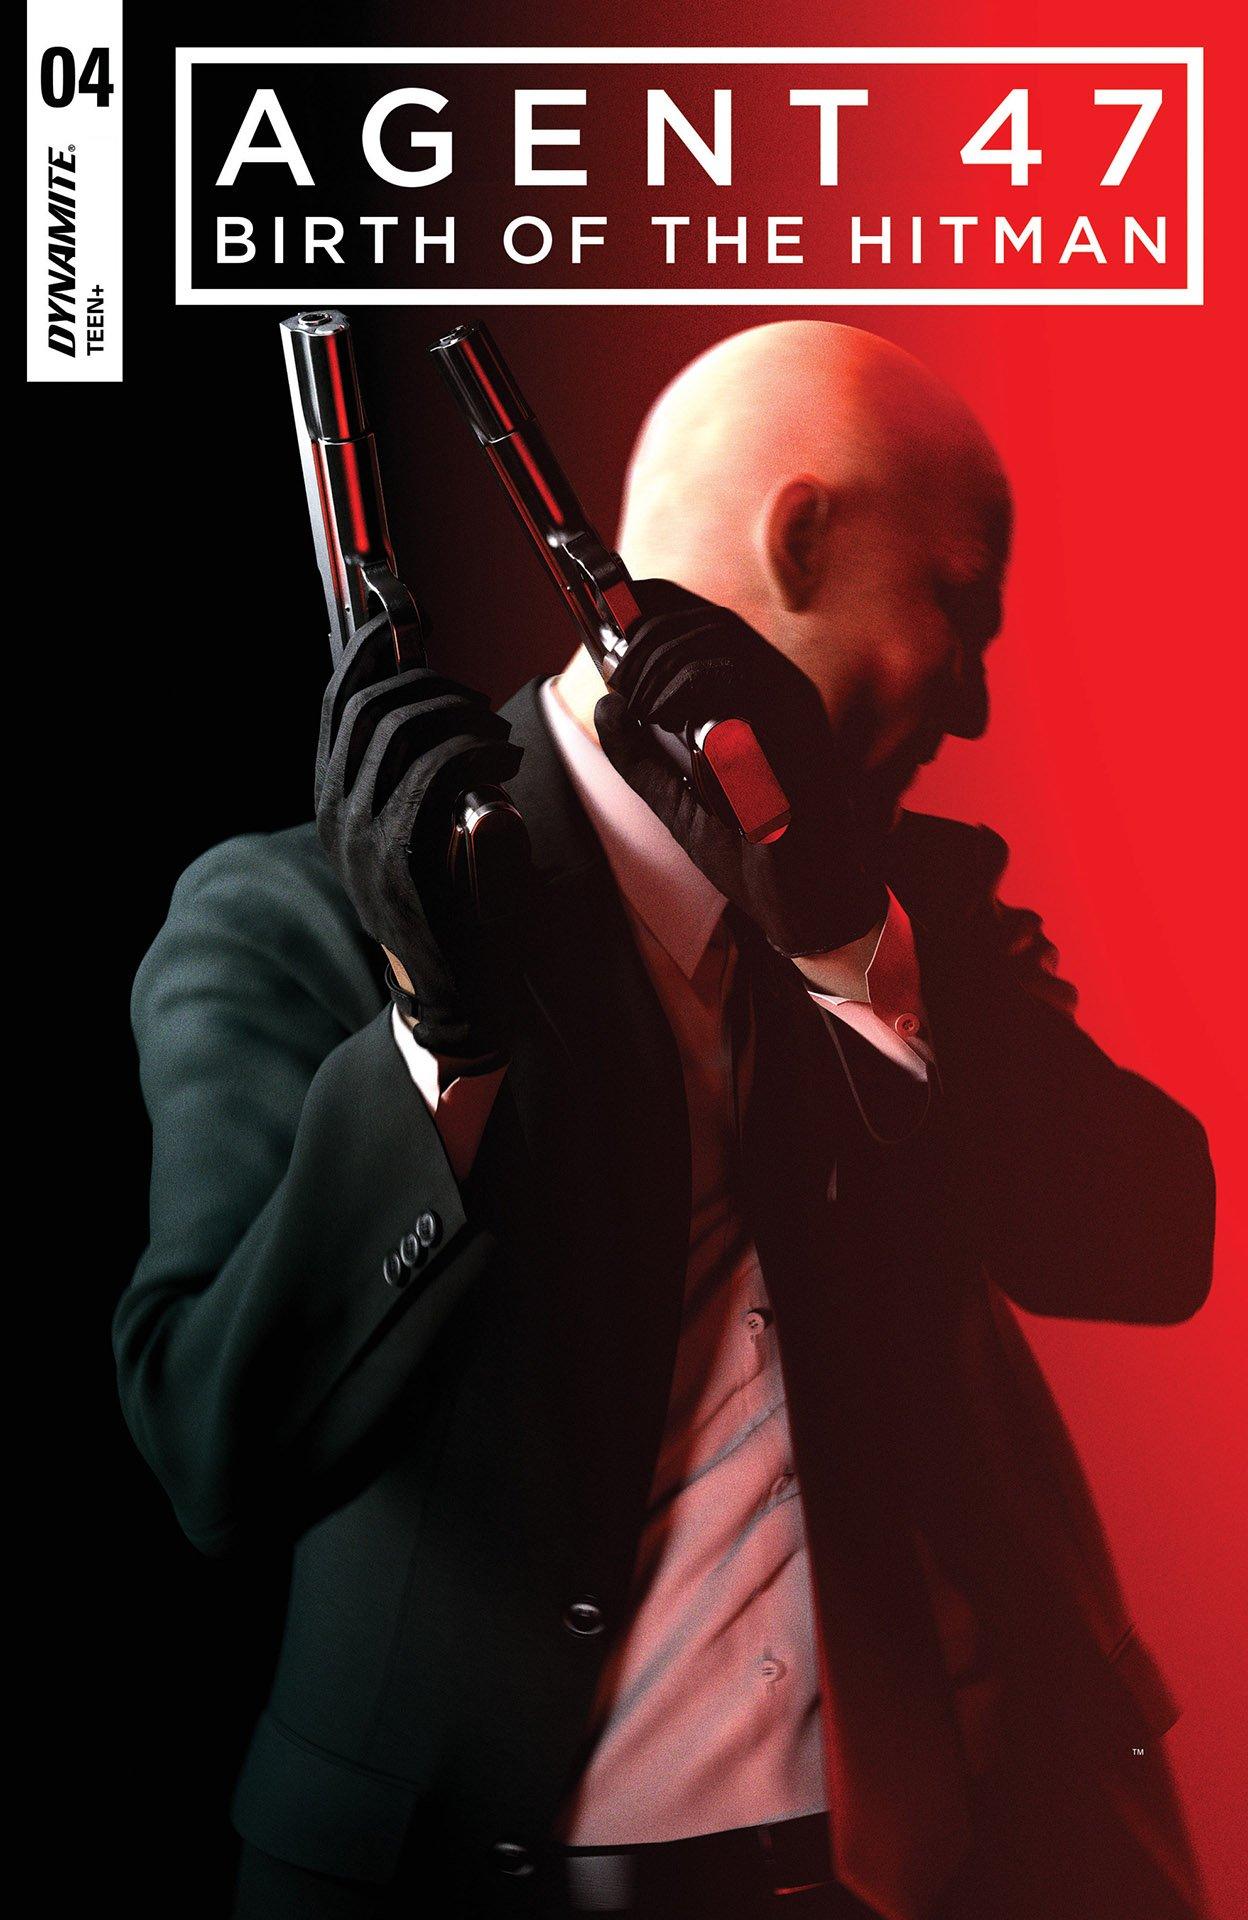 Agent 47 Birth Of The Hitman 004 2018 Cover B Hitman